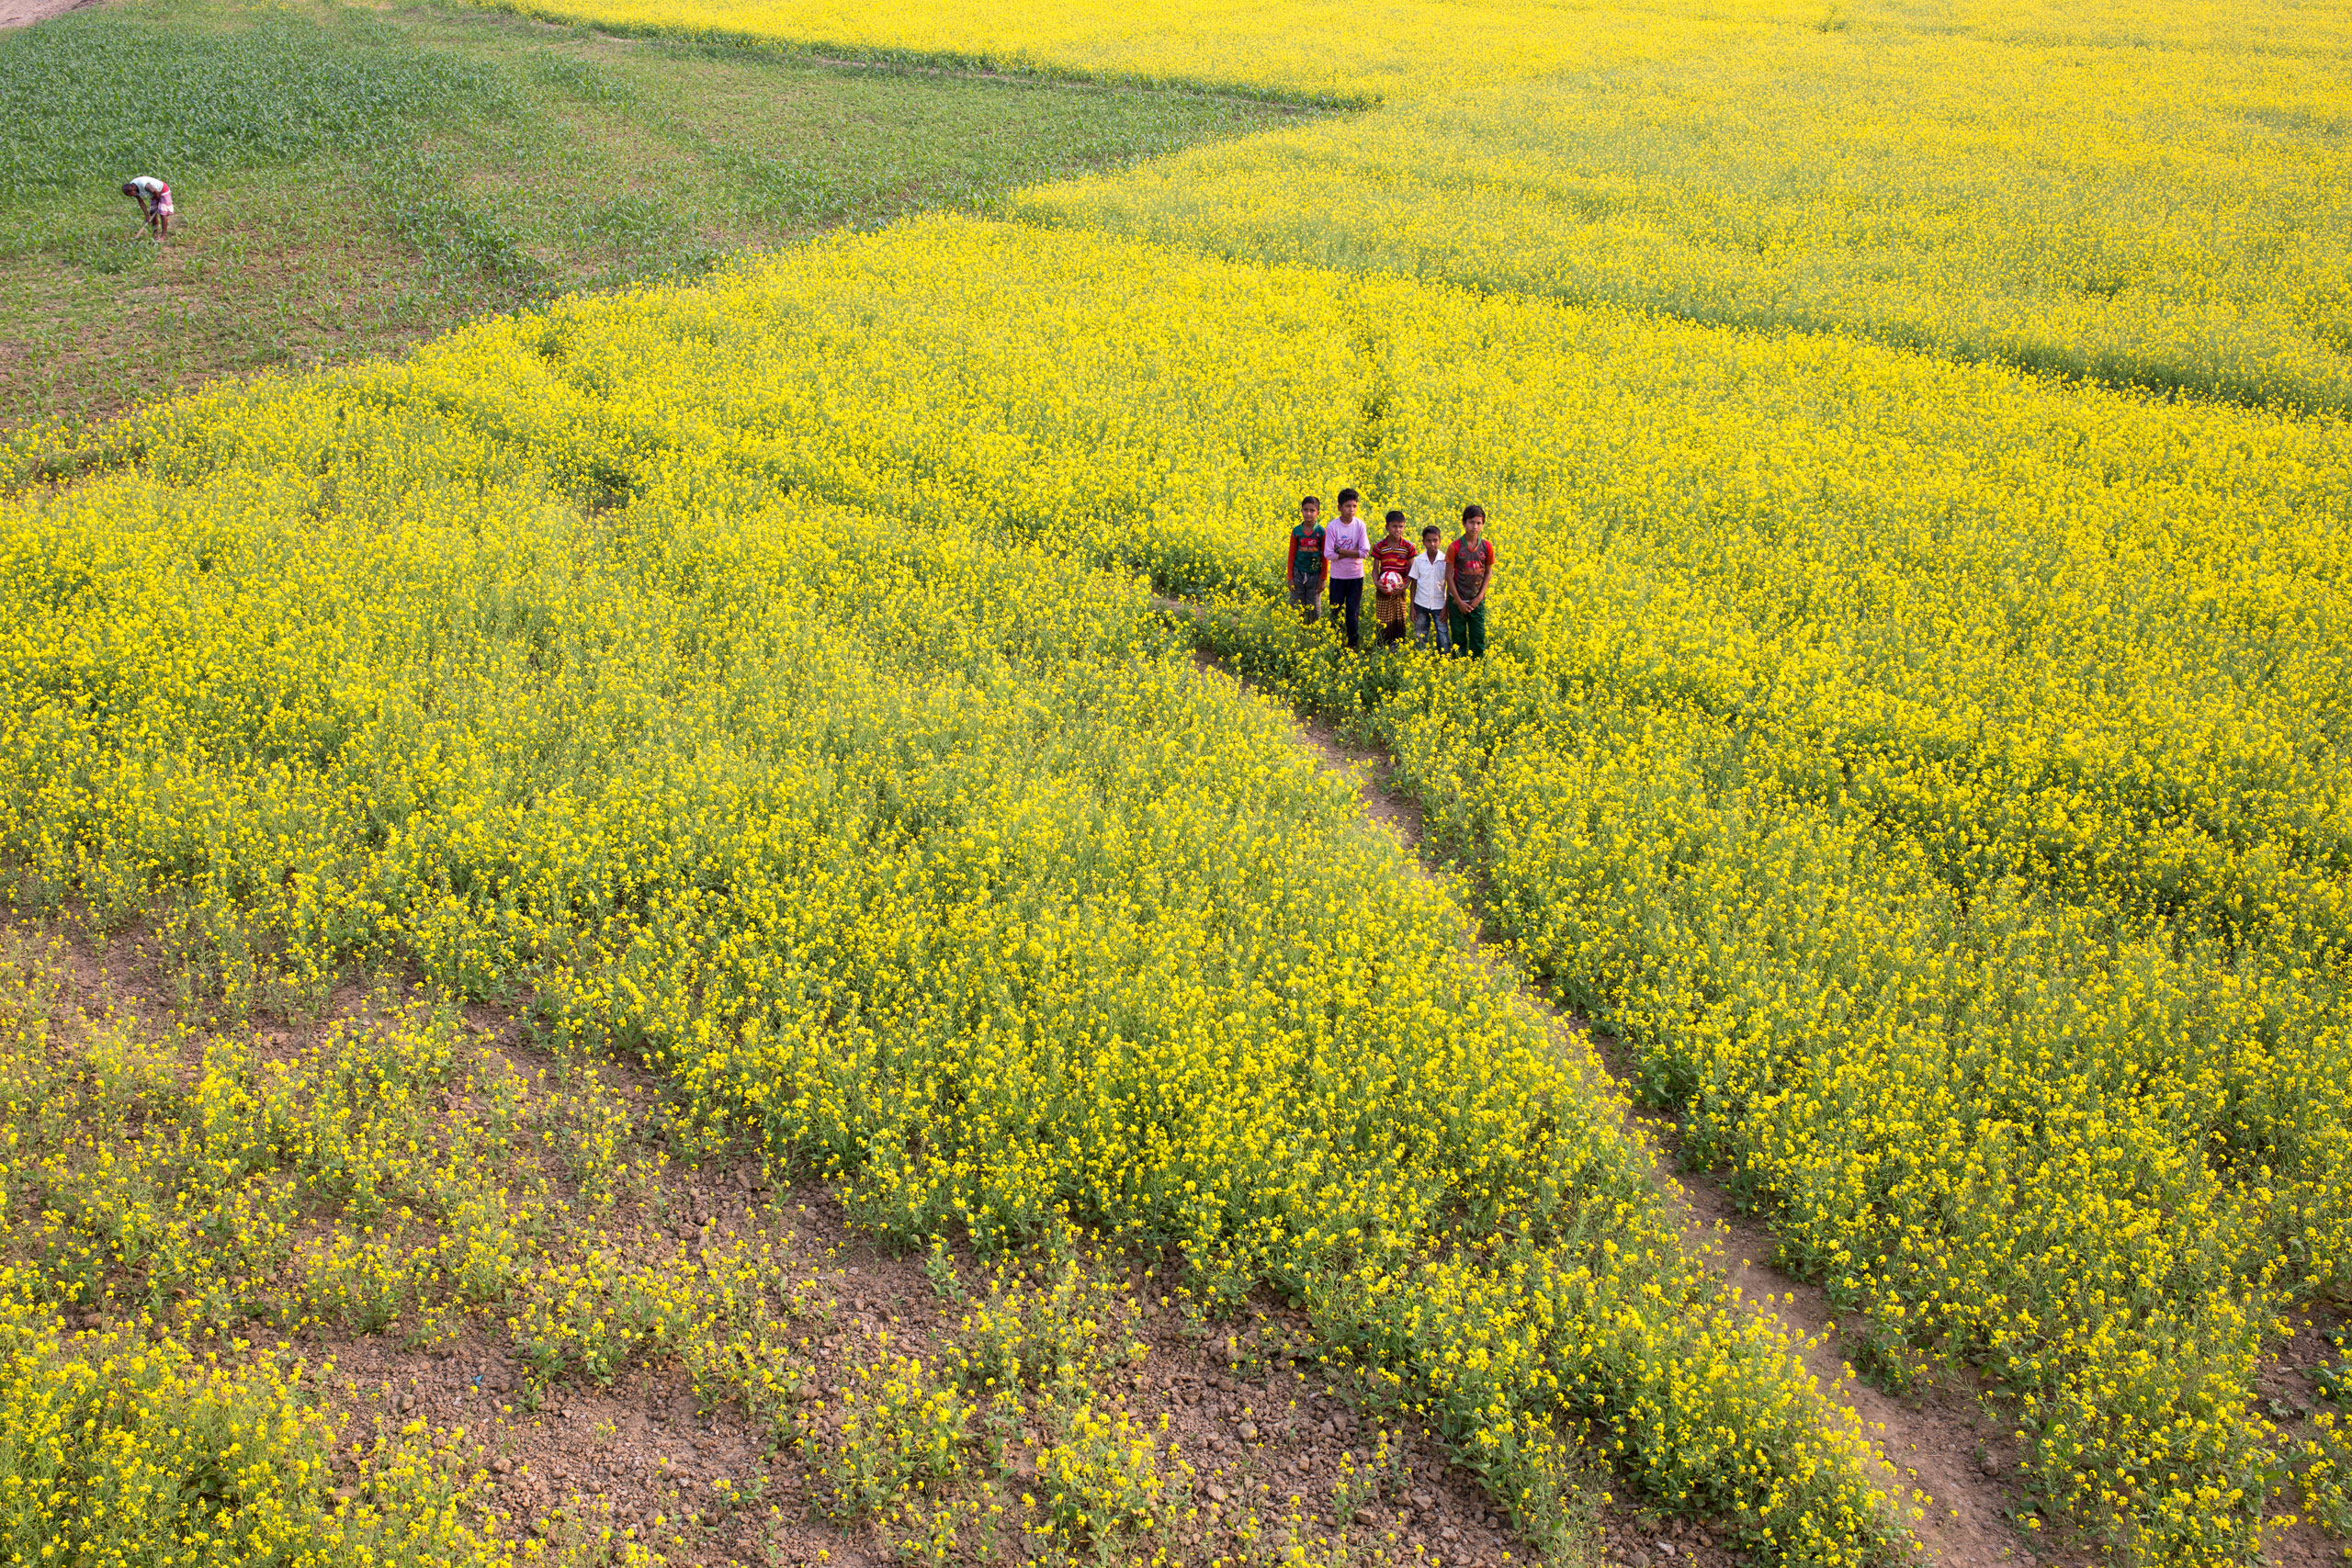 Children seen playing on a mustard field in Manikgonj, Bangladesh on Jan. 8, 2017.